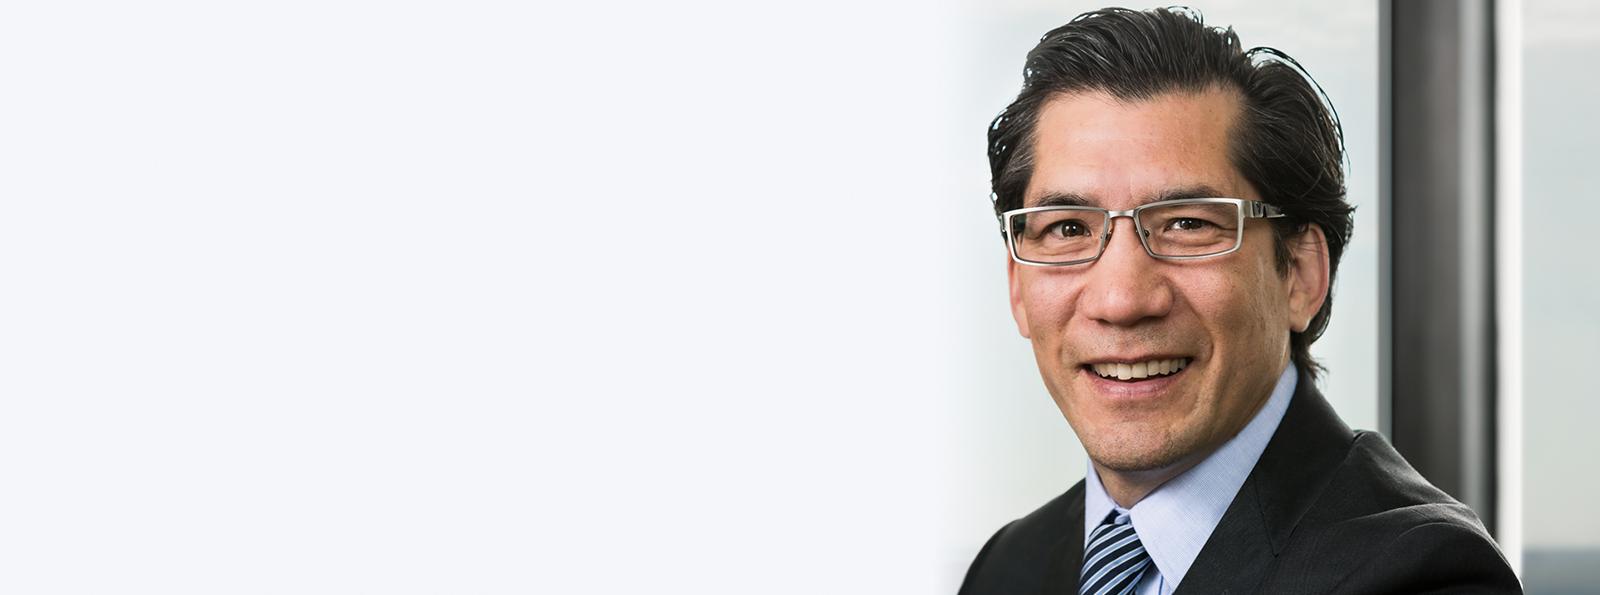 Photo of insurance defence lawyer Mitchell (Mitch) Kitagawa of Kelly Santini LLP in Ottawa